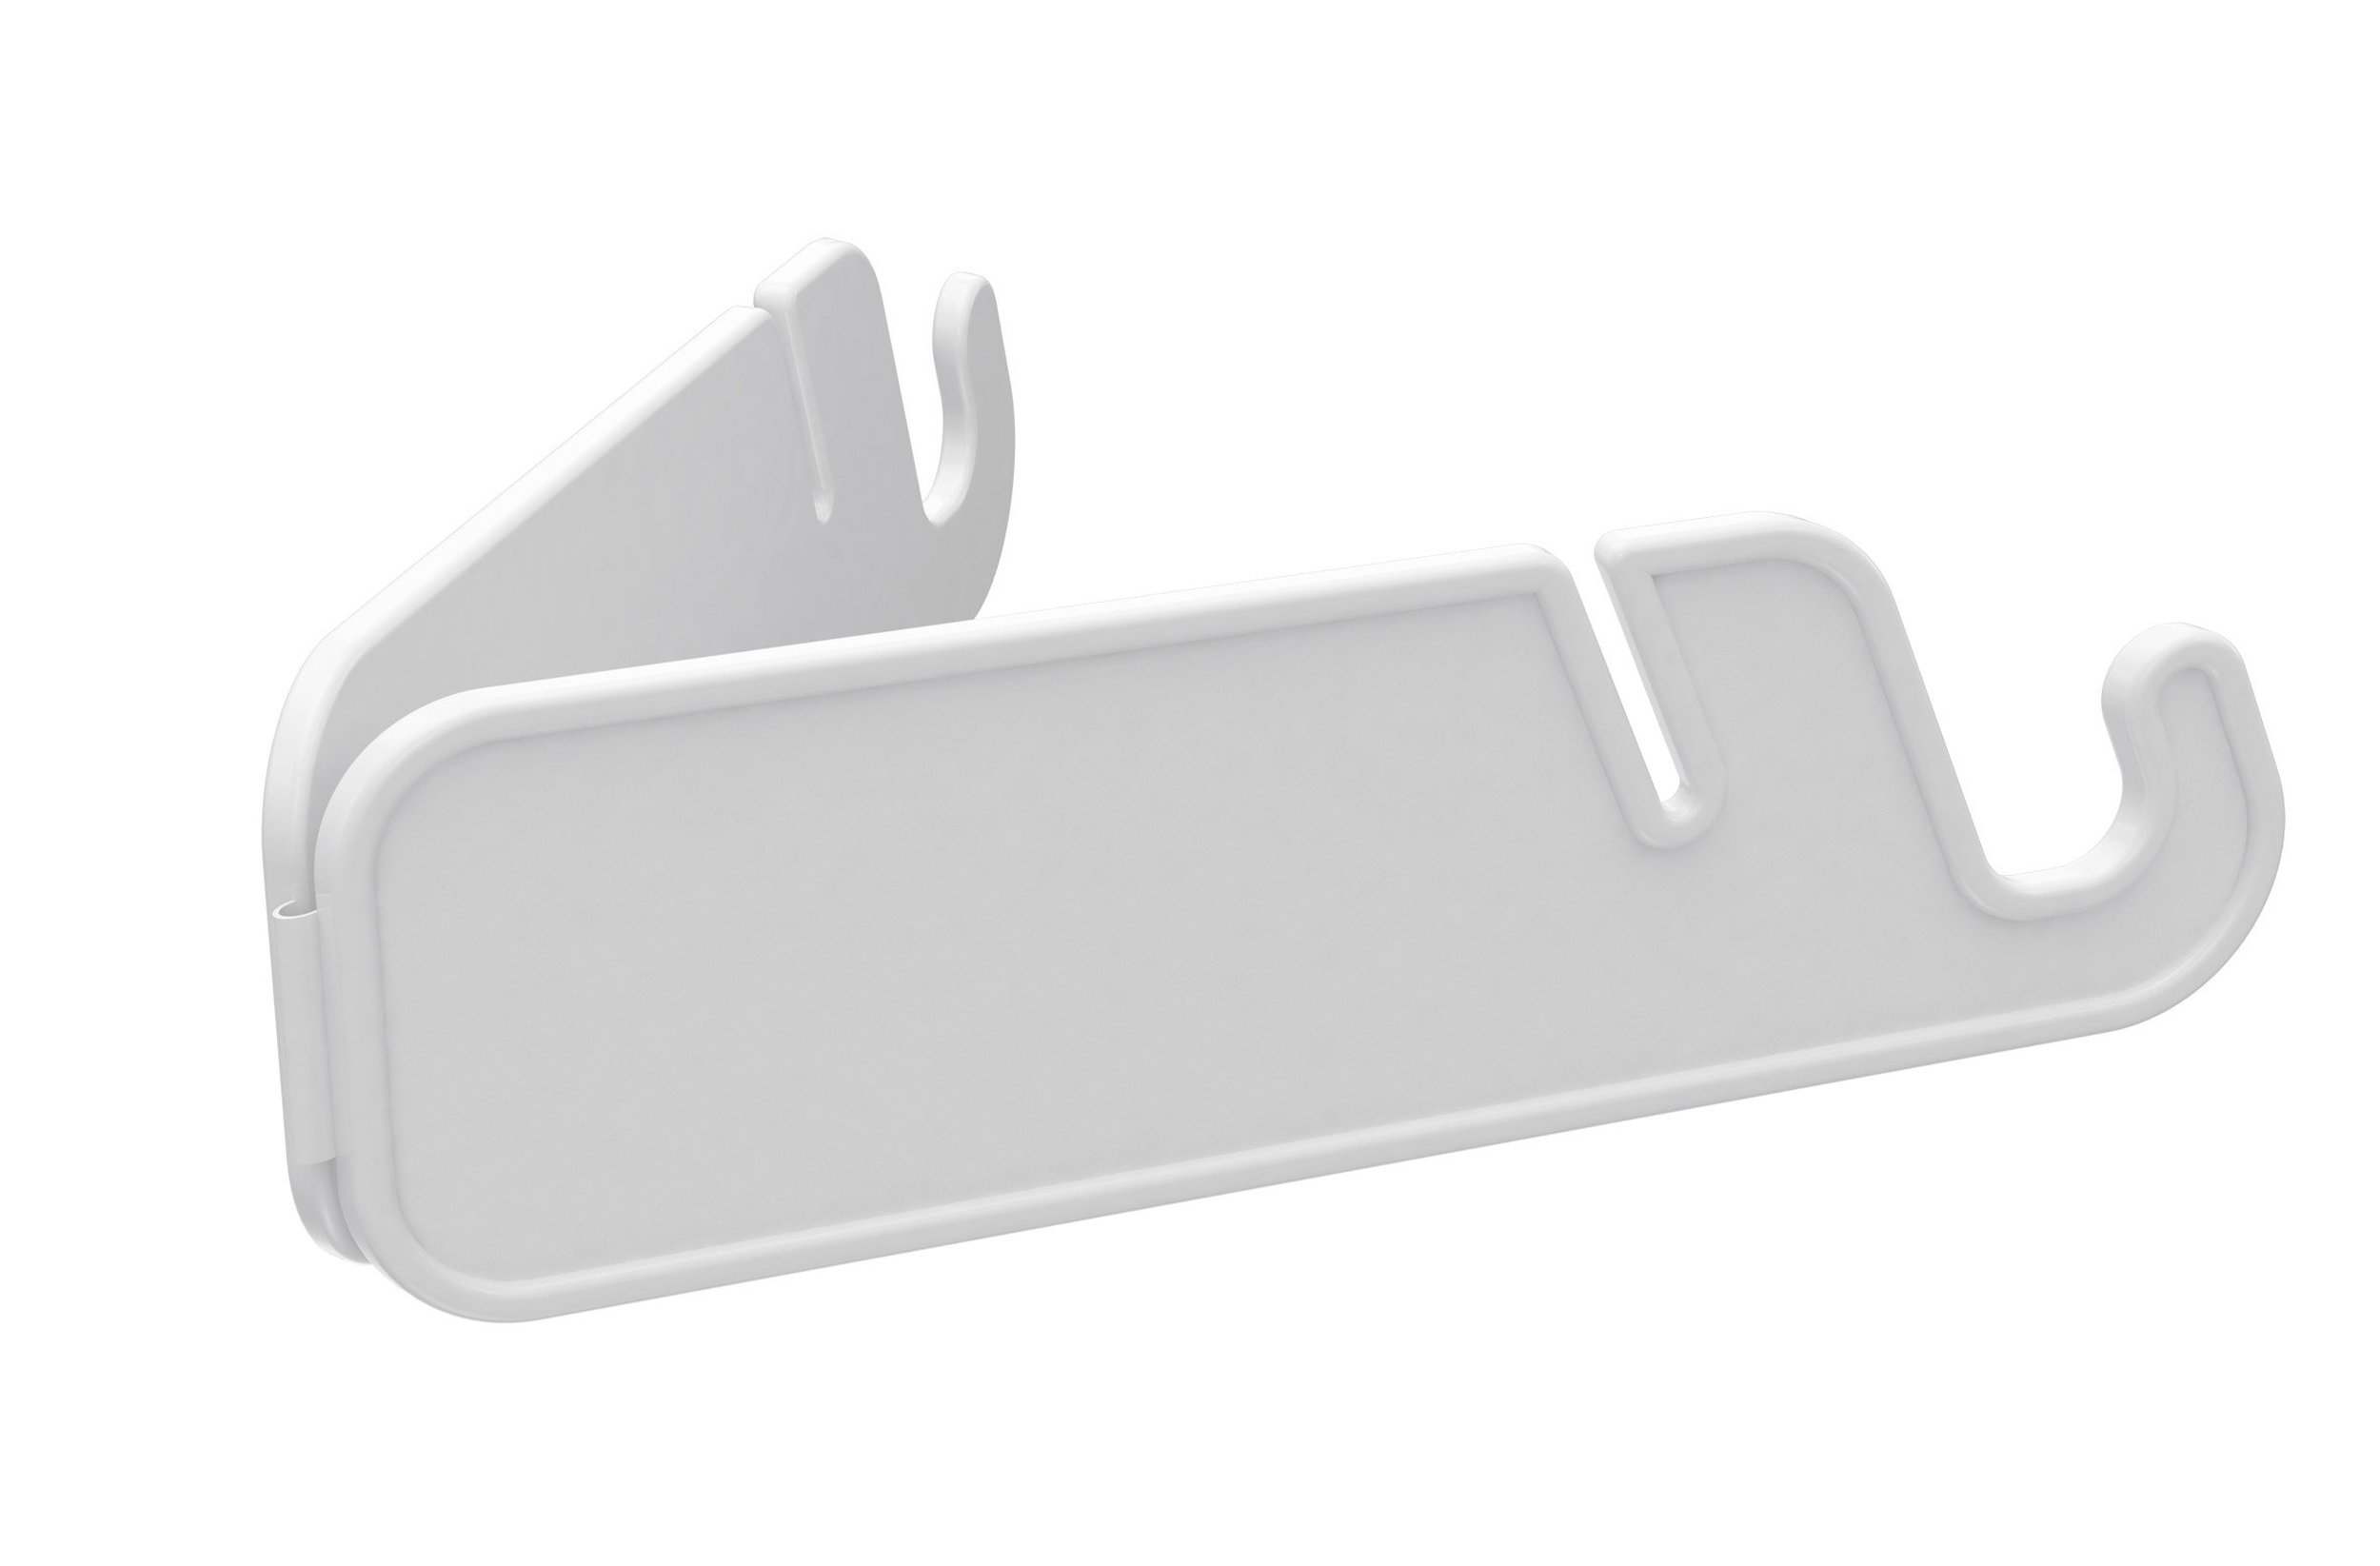 Podstawka pod tablet Dumbo biała